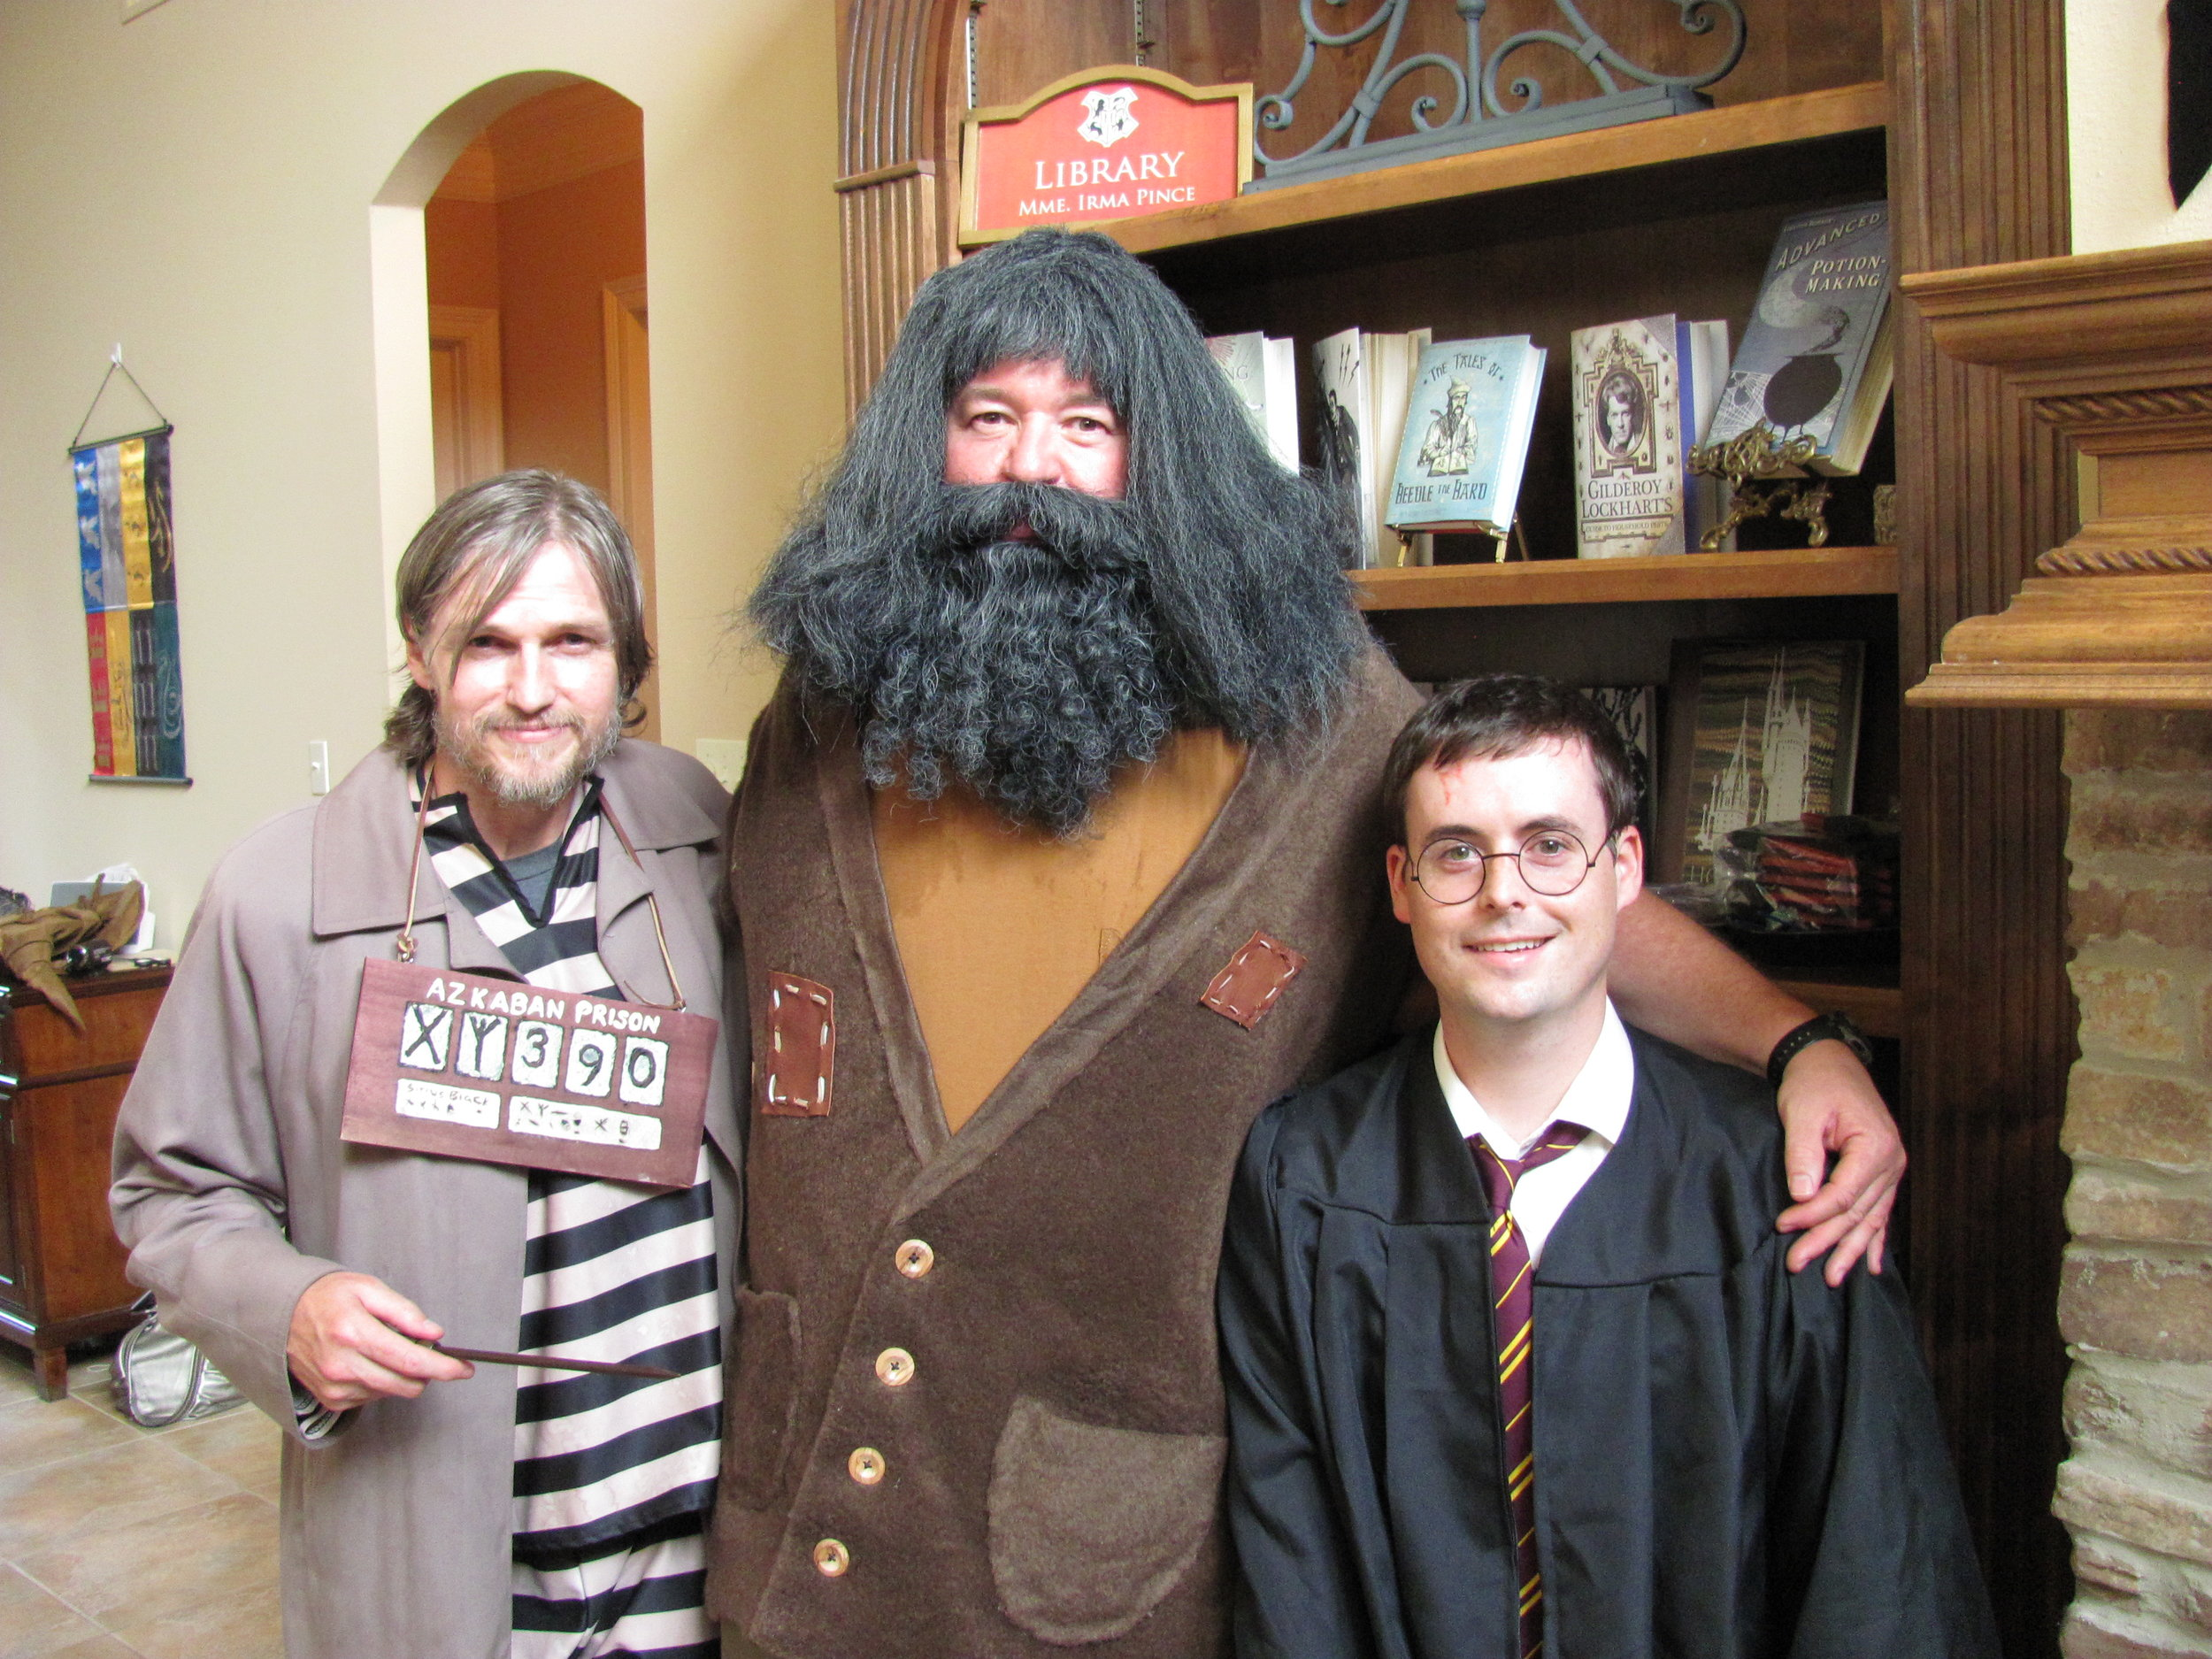 Sirius, Hagrid and Harry Potter ...